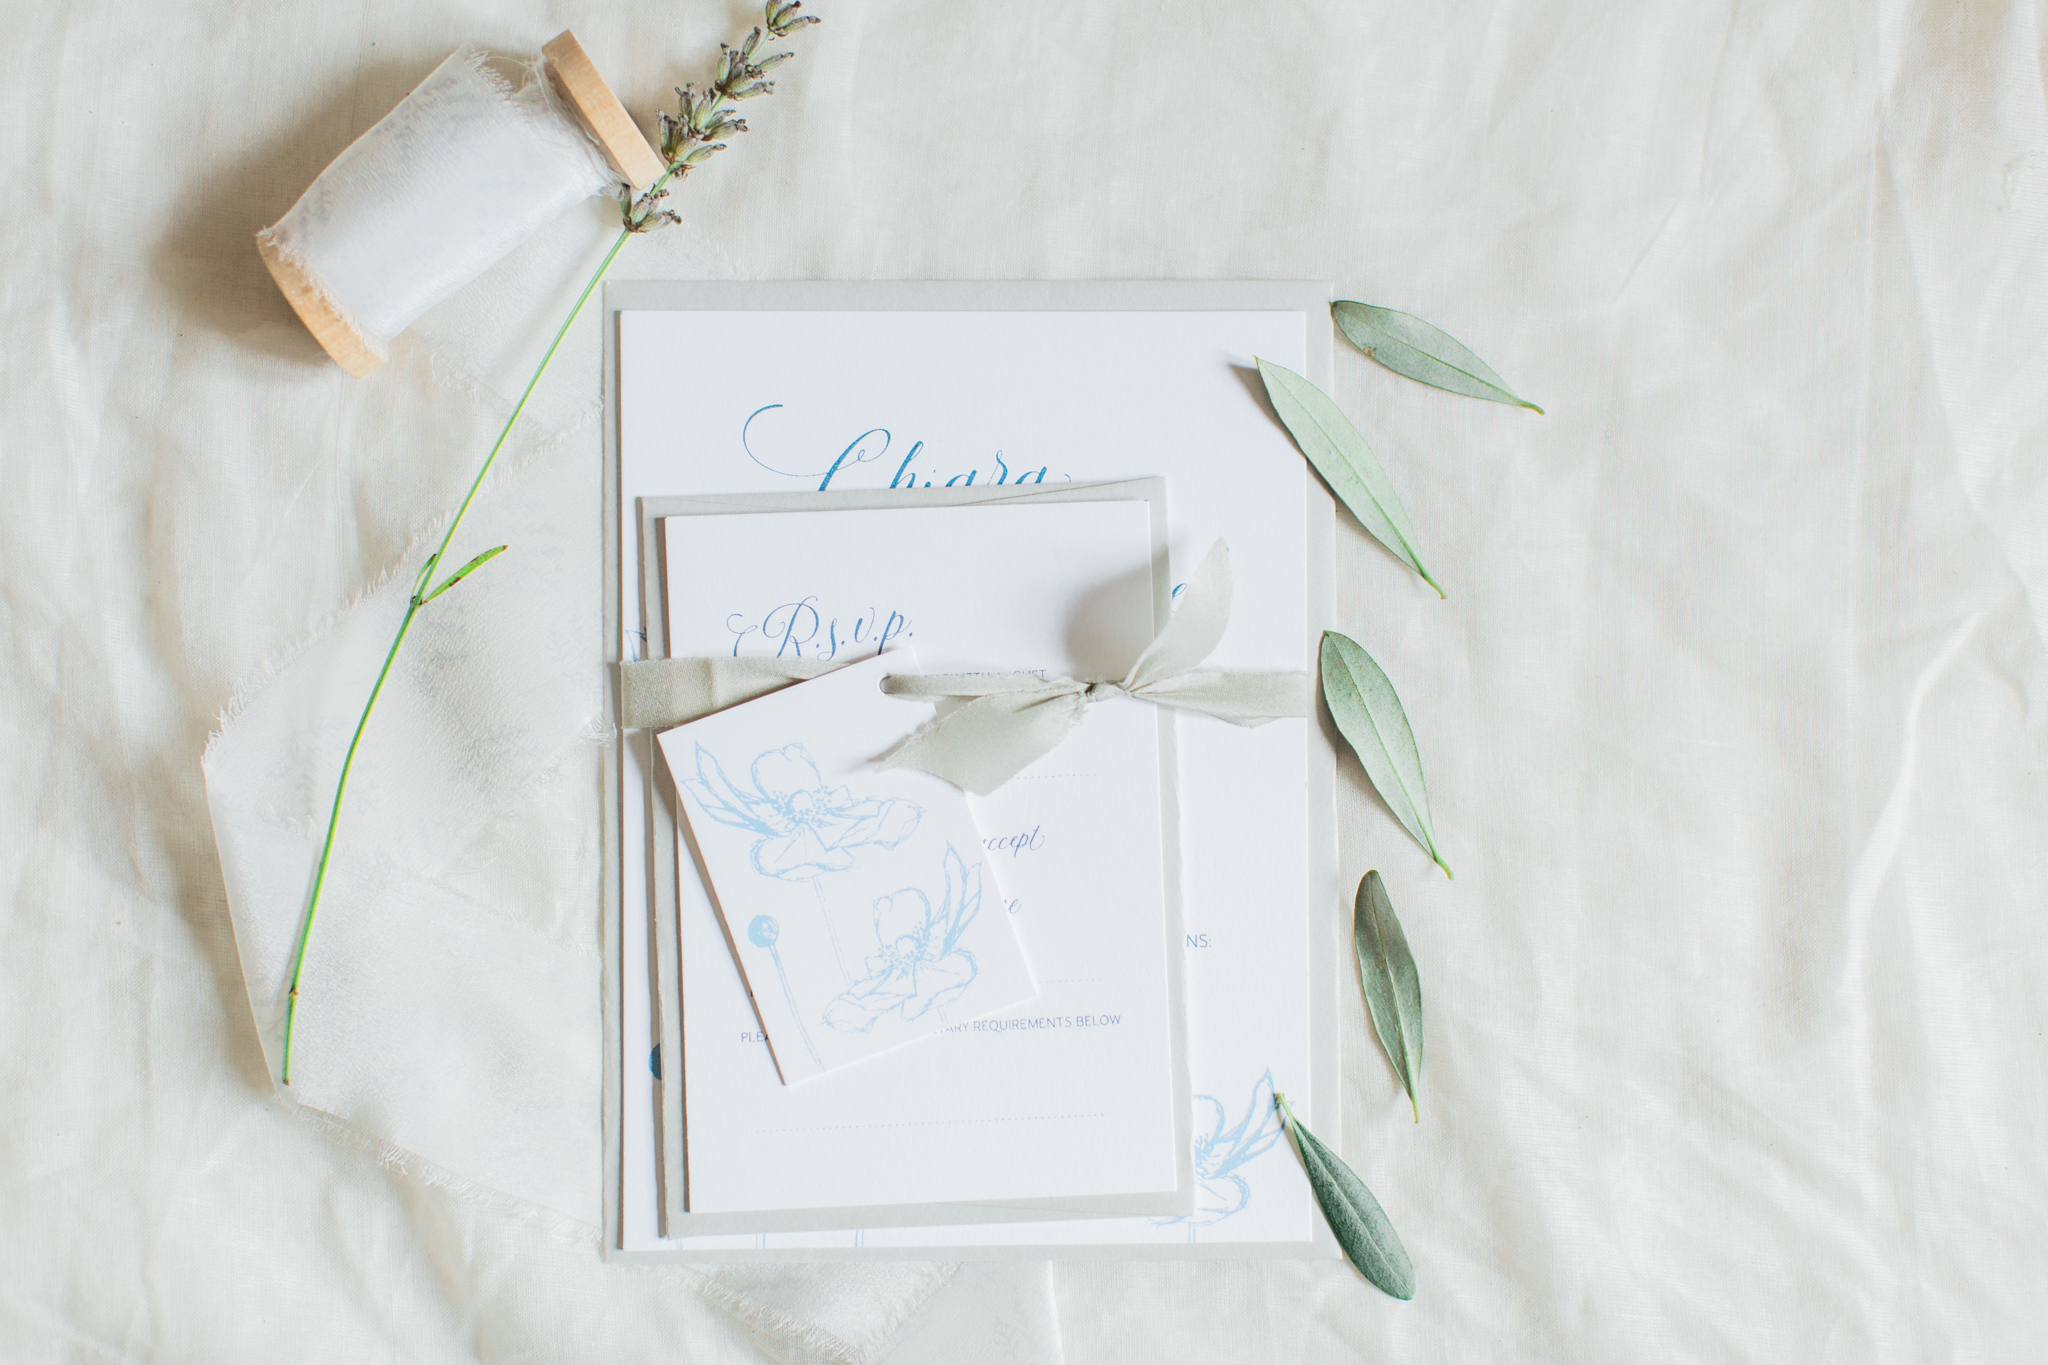 Inkflower Press Anemone silkscreen printed wedding invitation suite - Copenhagen Blue